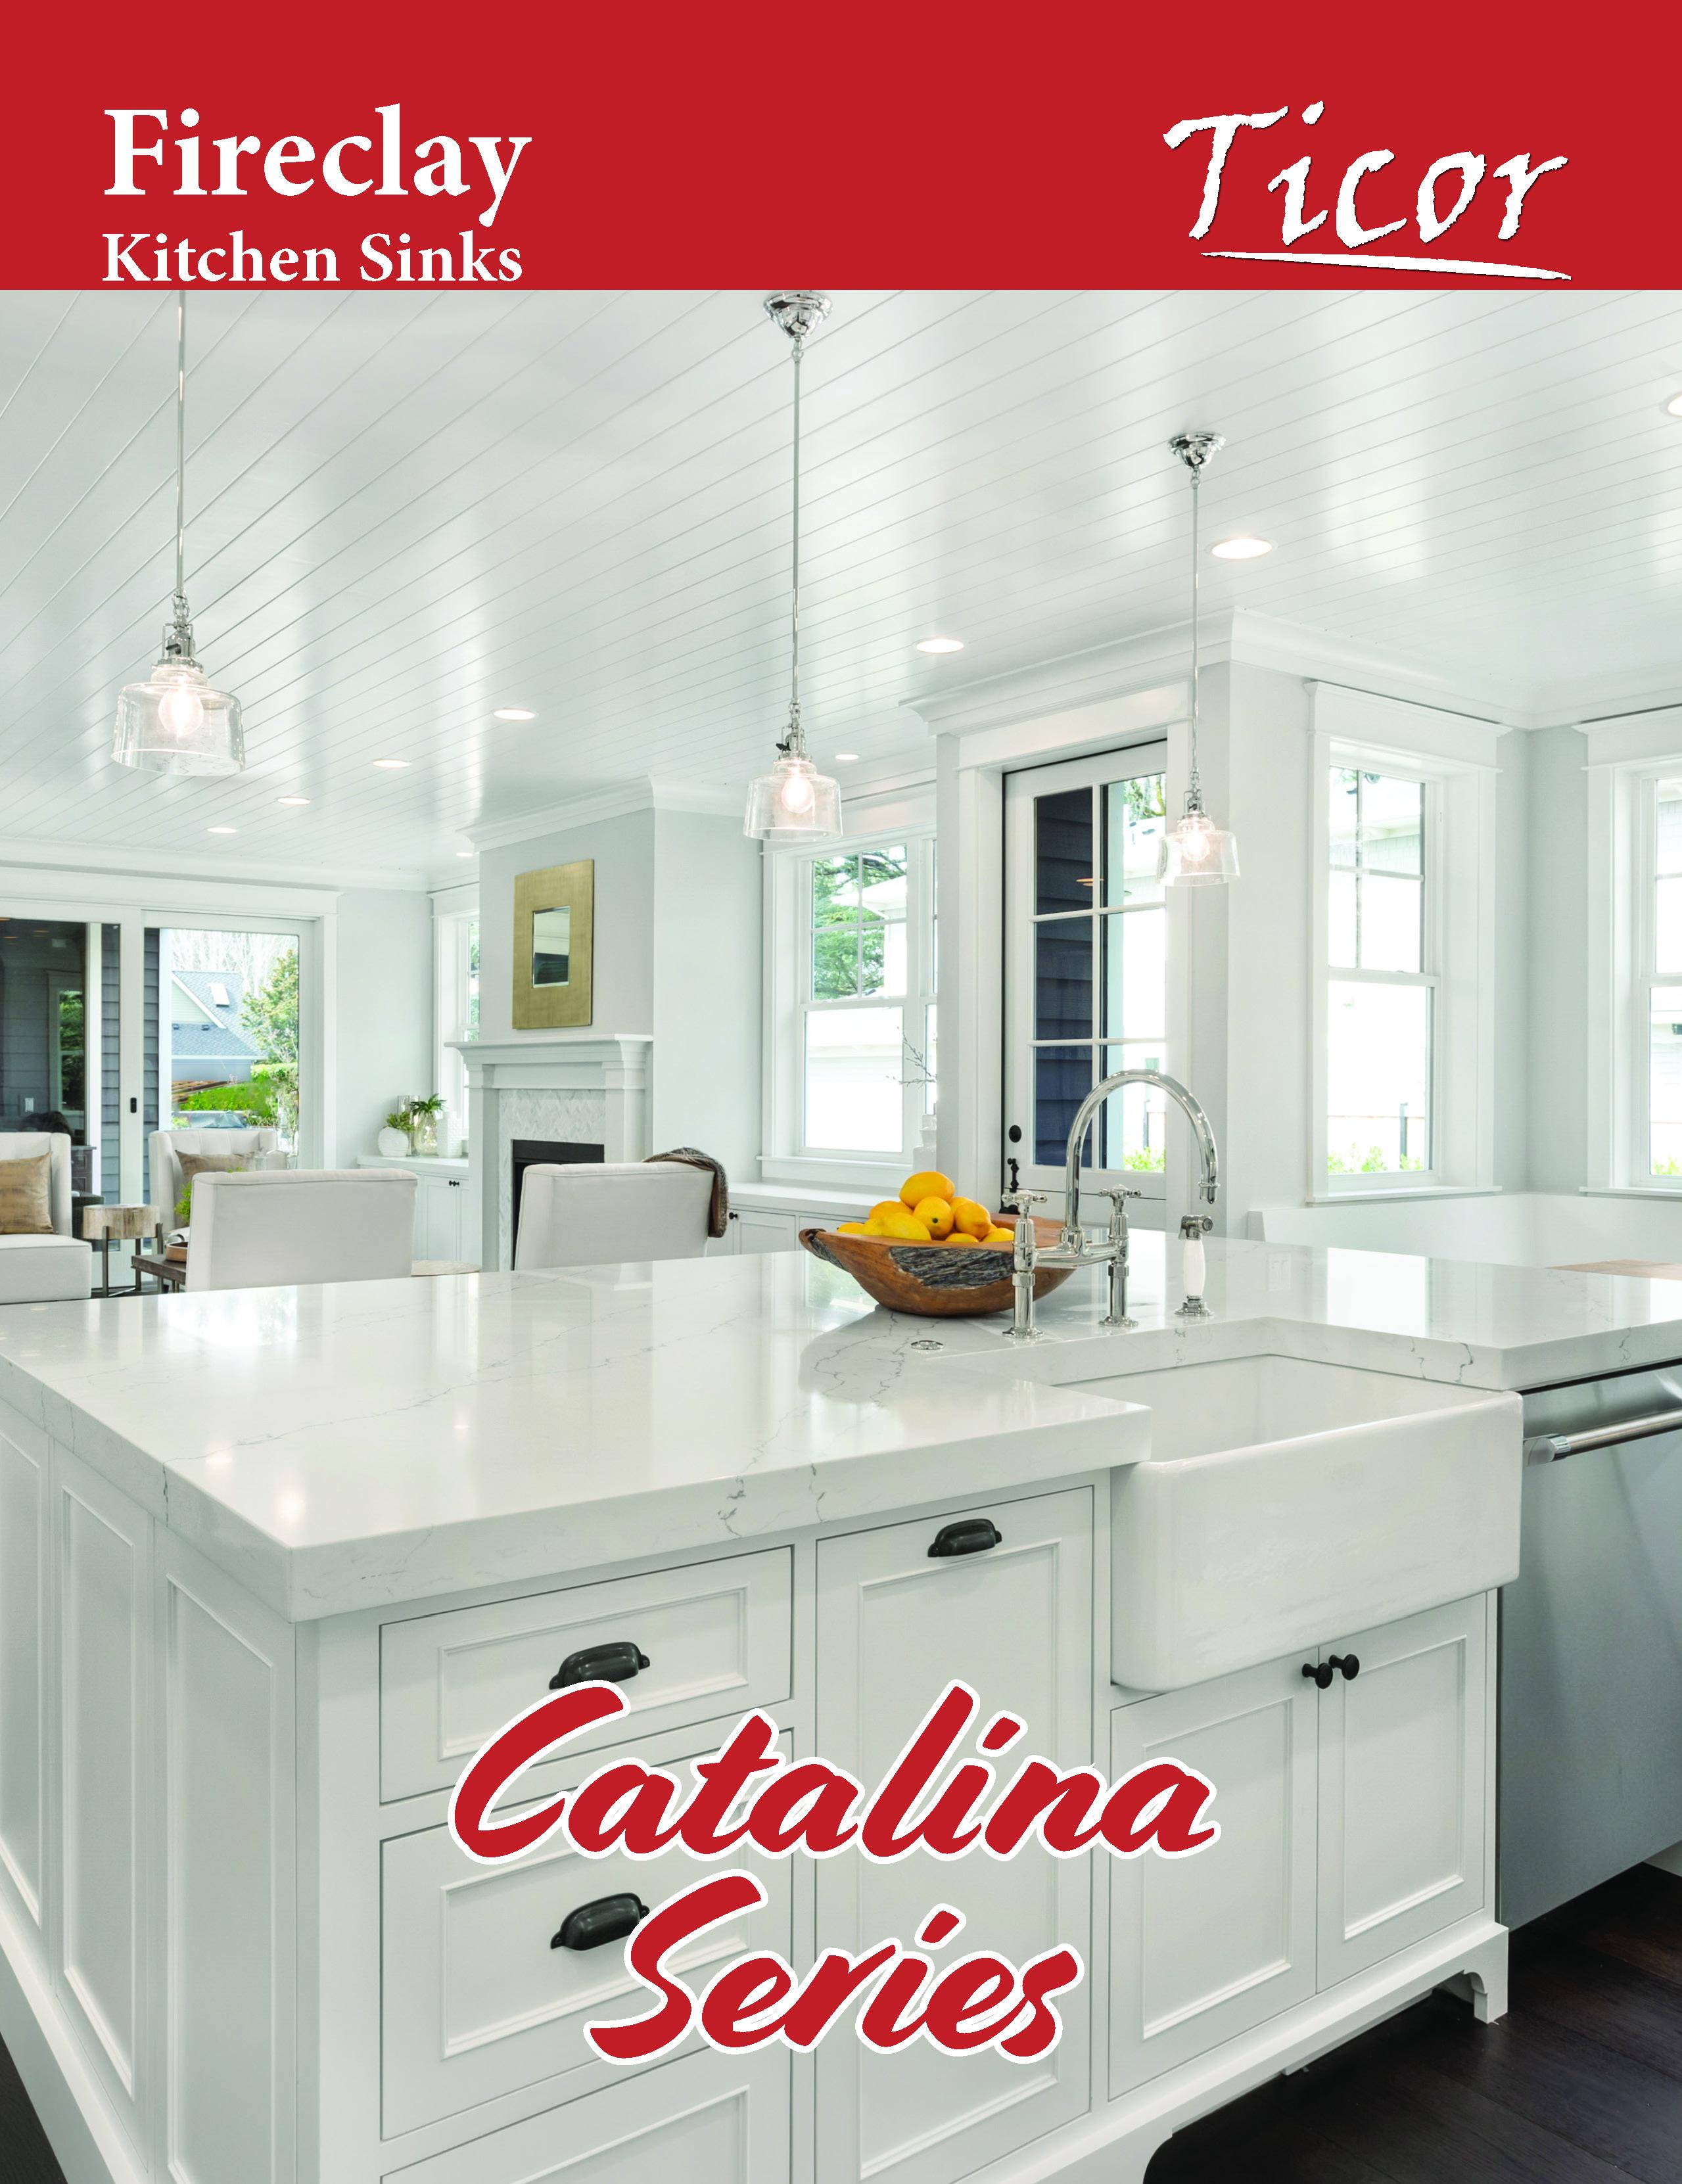 catalinafireclaysinkcatalog-page-1.jpg